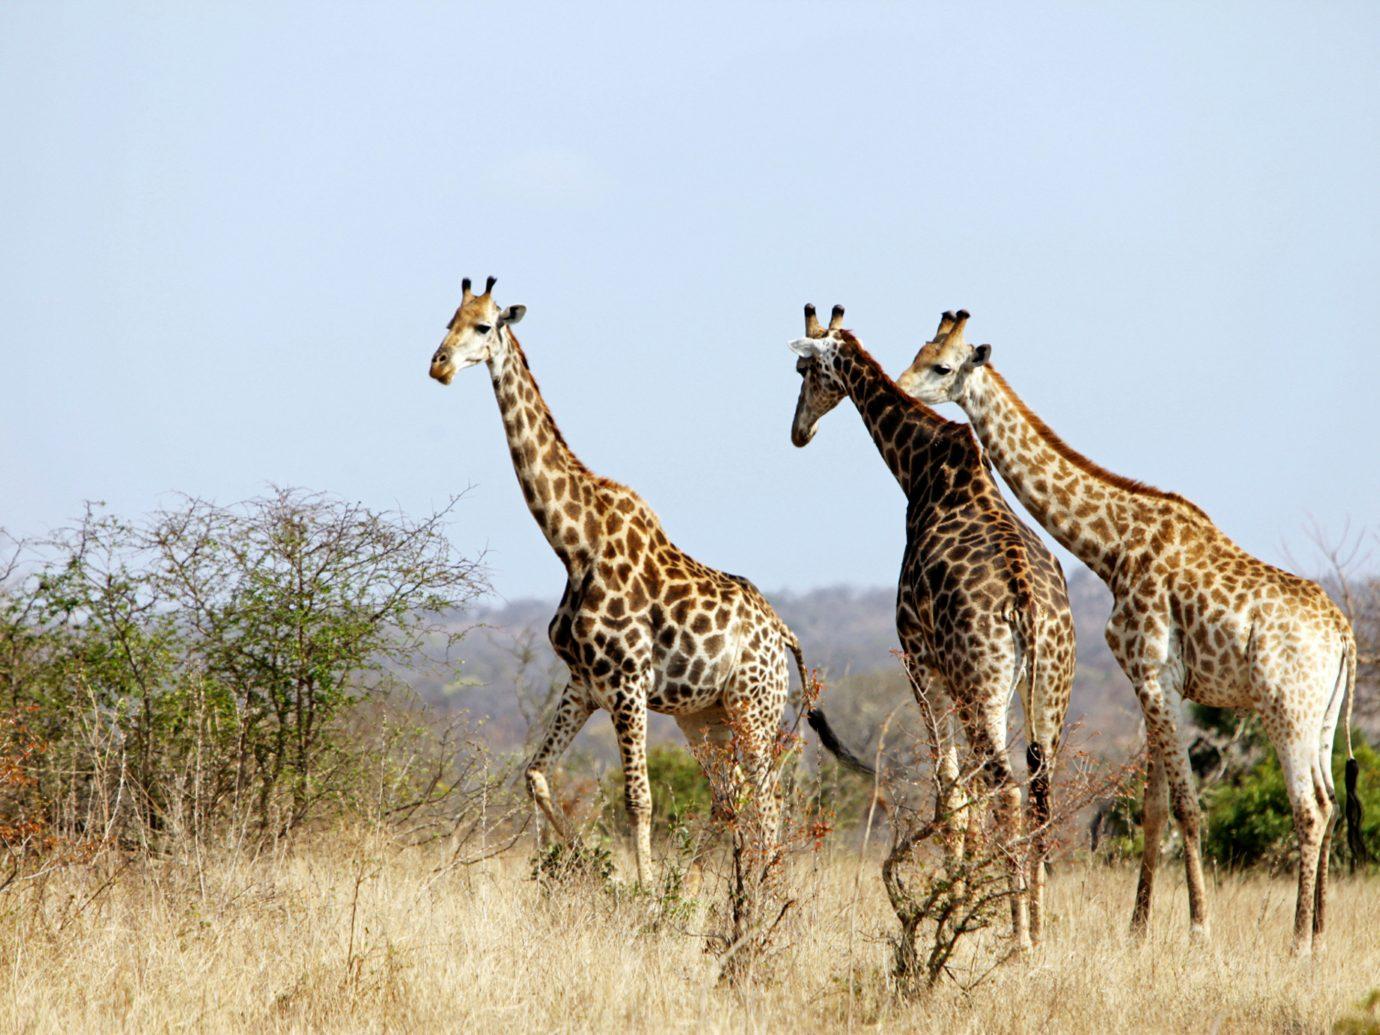 Hotels Trip Ideas outdoor grass sky giraffe mammal animal field Wildlife giraffidae fauna savanna grassy Safari Adventure grassland dry wild